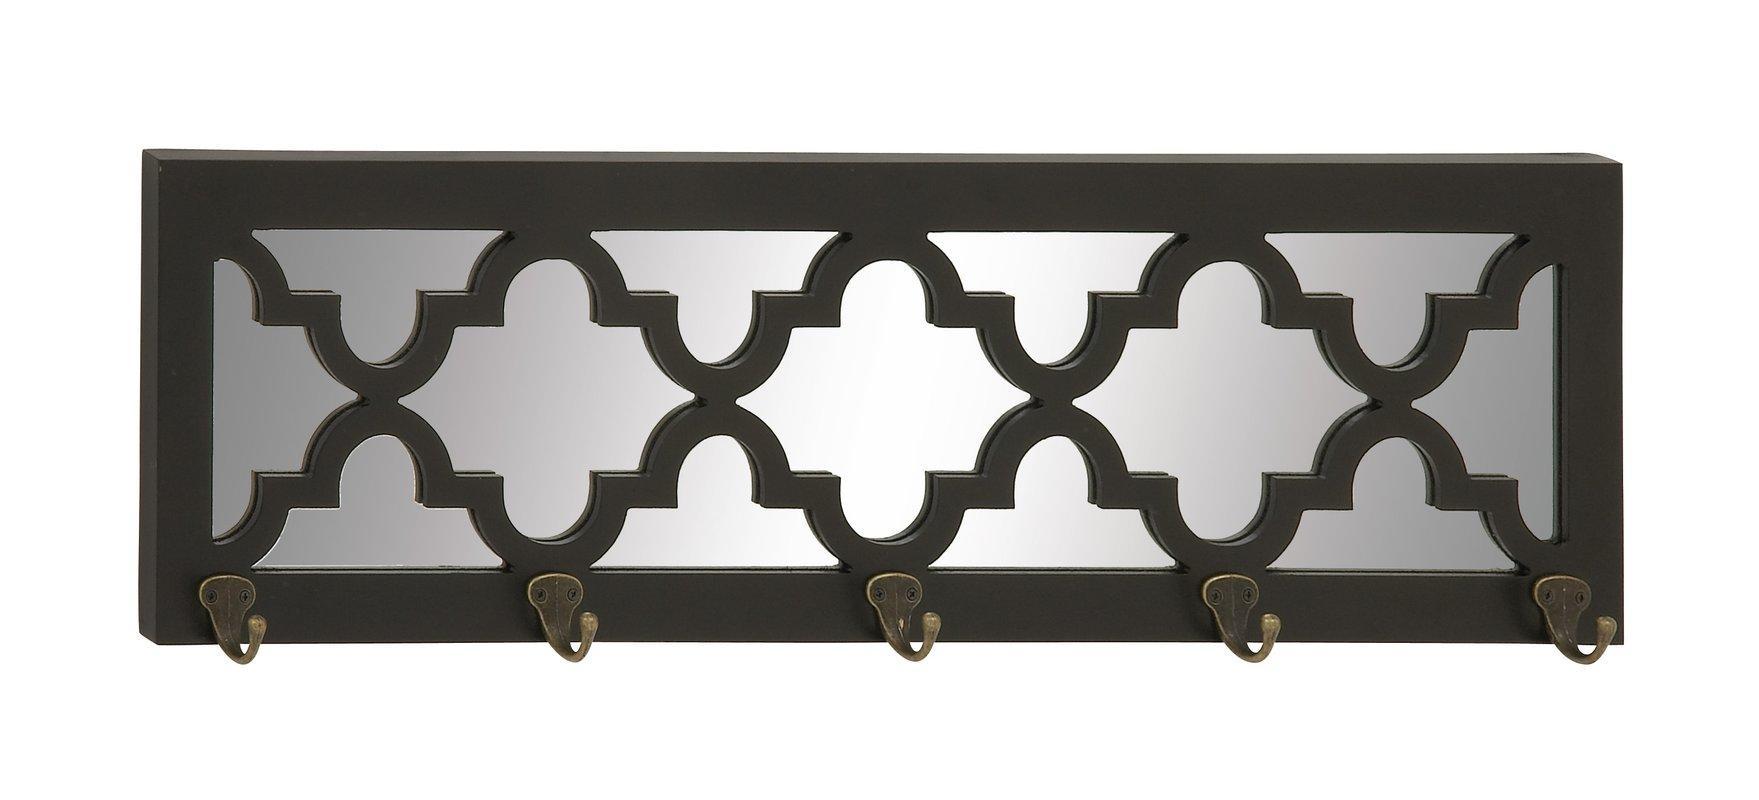 Cole & Grey Wood Mirror Wall Mounted Coat Rack & Reviews | Wayfair Within Kohl's Metal Wall Art (Image 4 of 20)